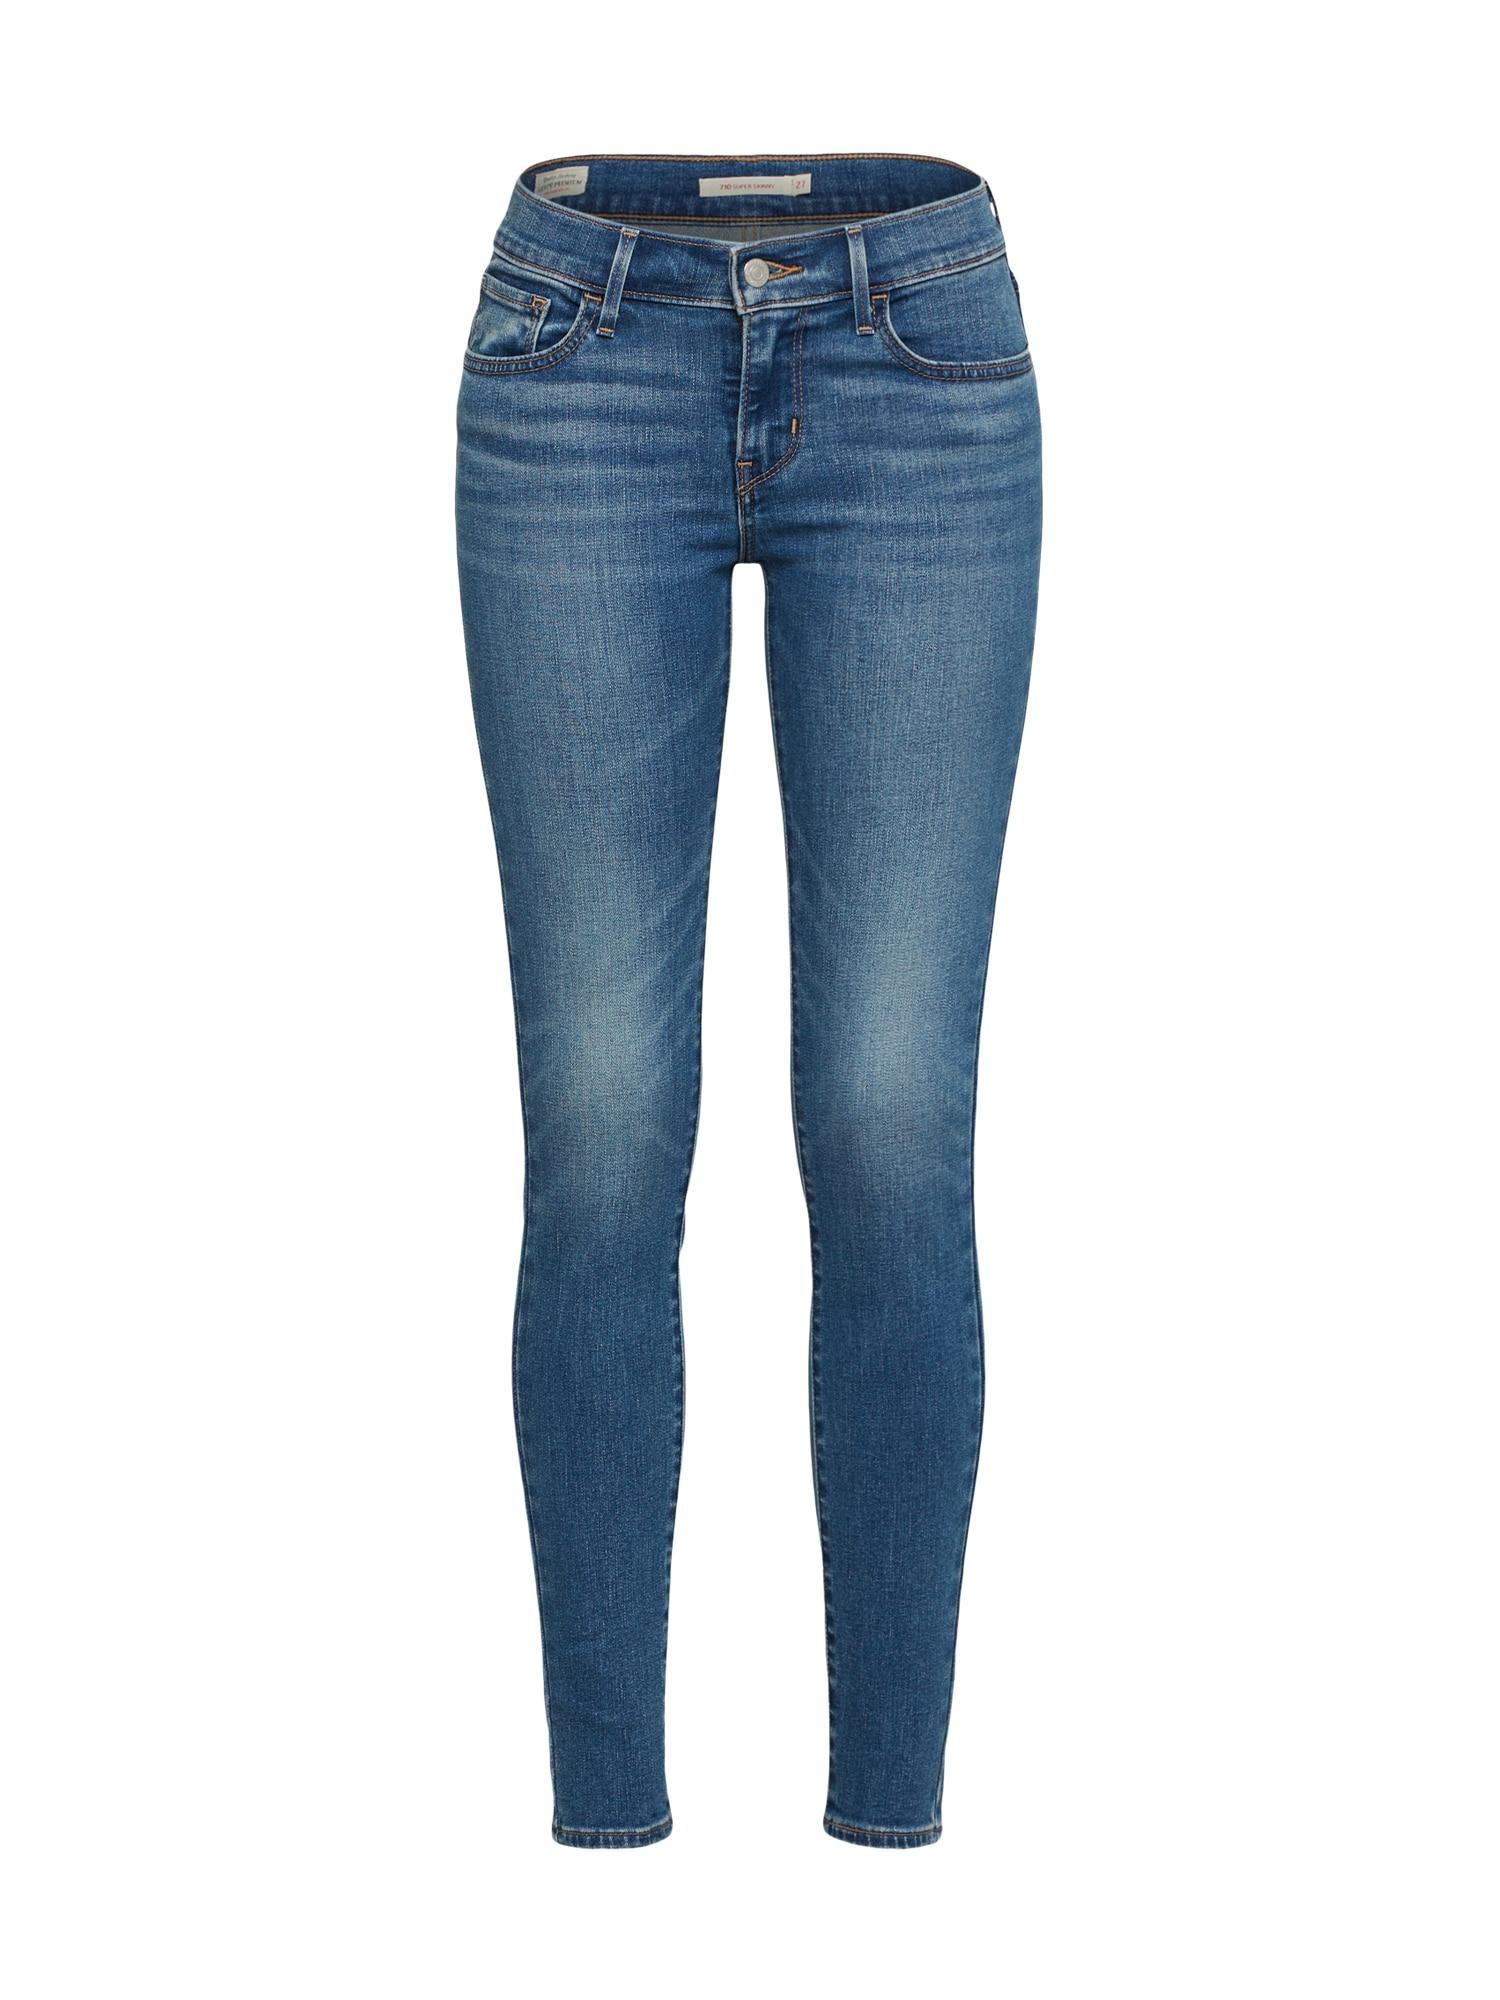 LEVI'S Dames Jeans 710 SUPER SKINNY blauw denim